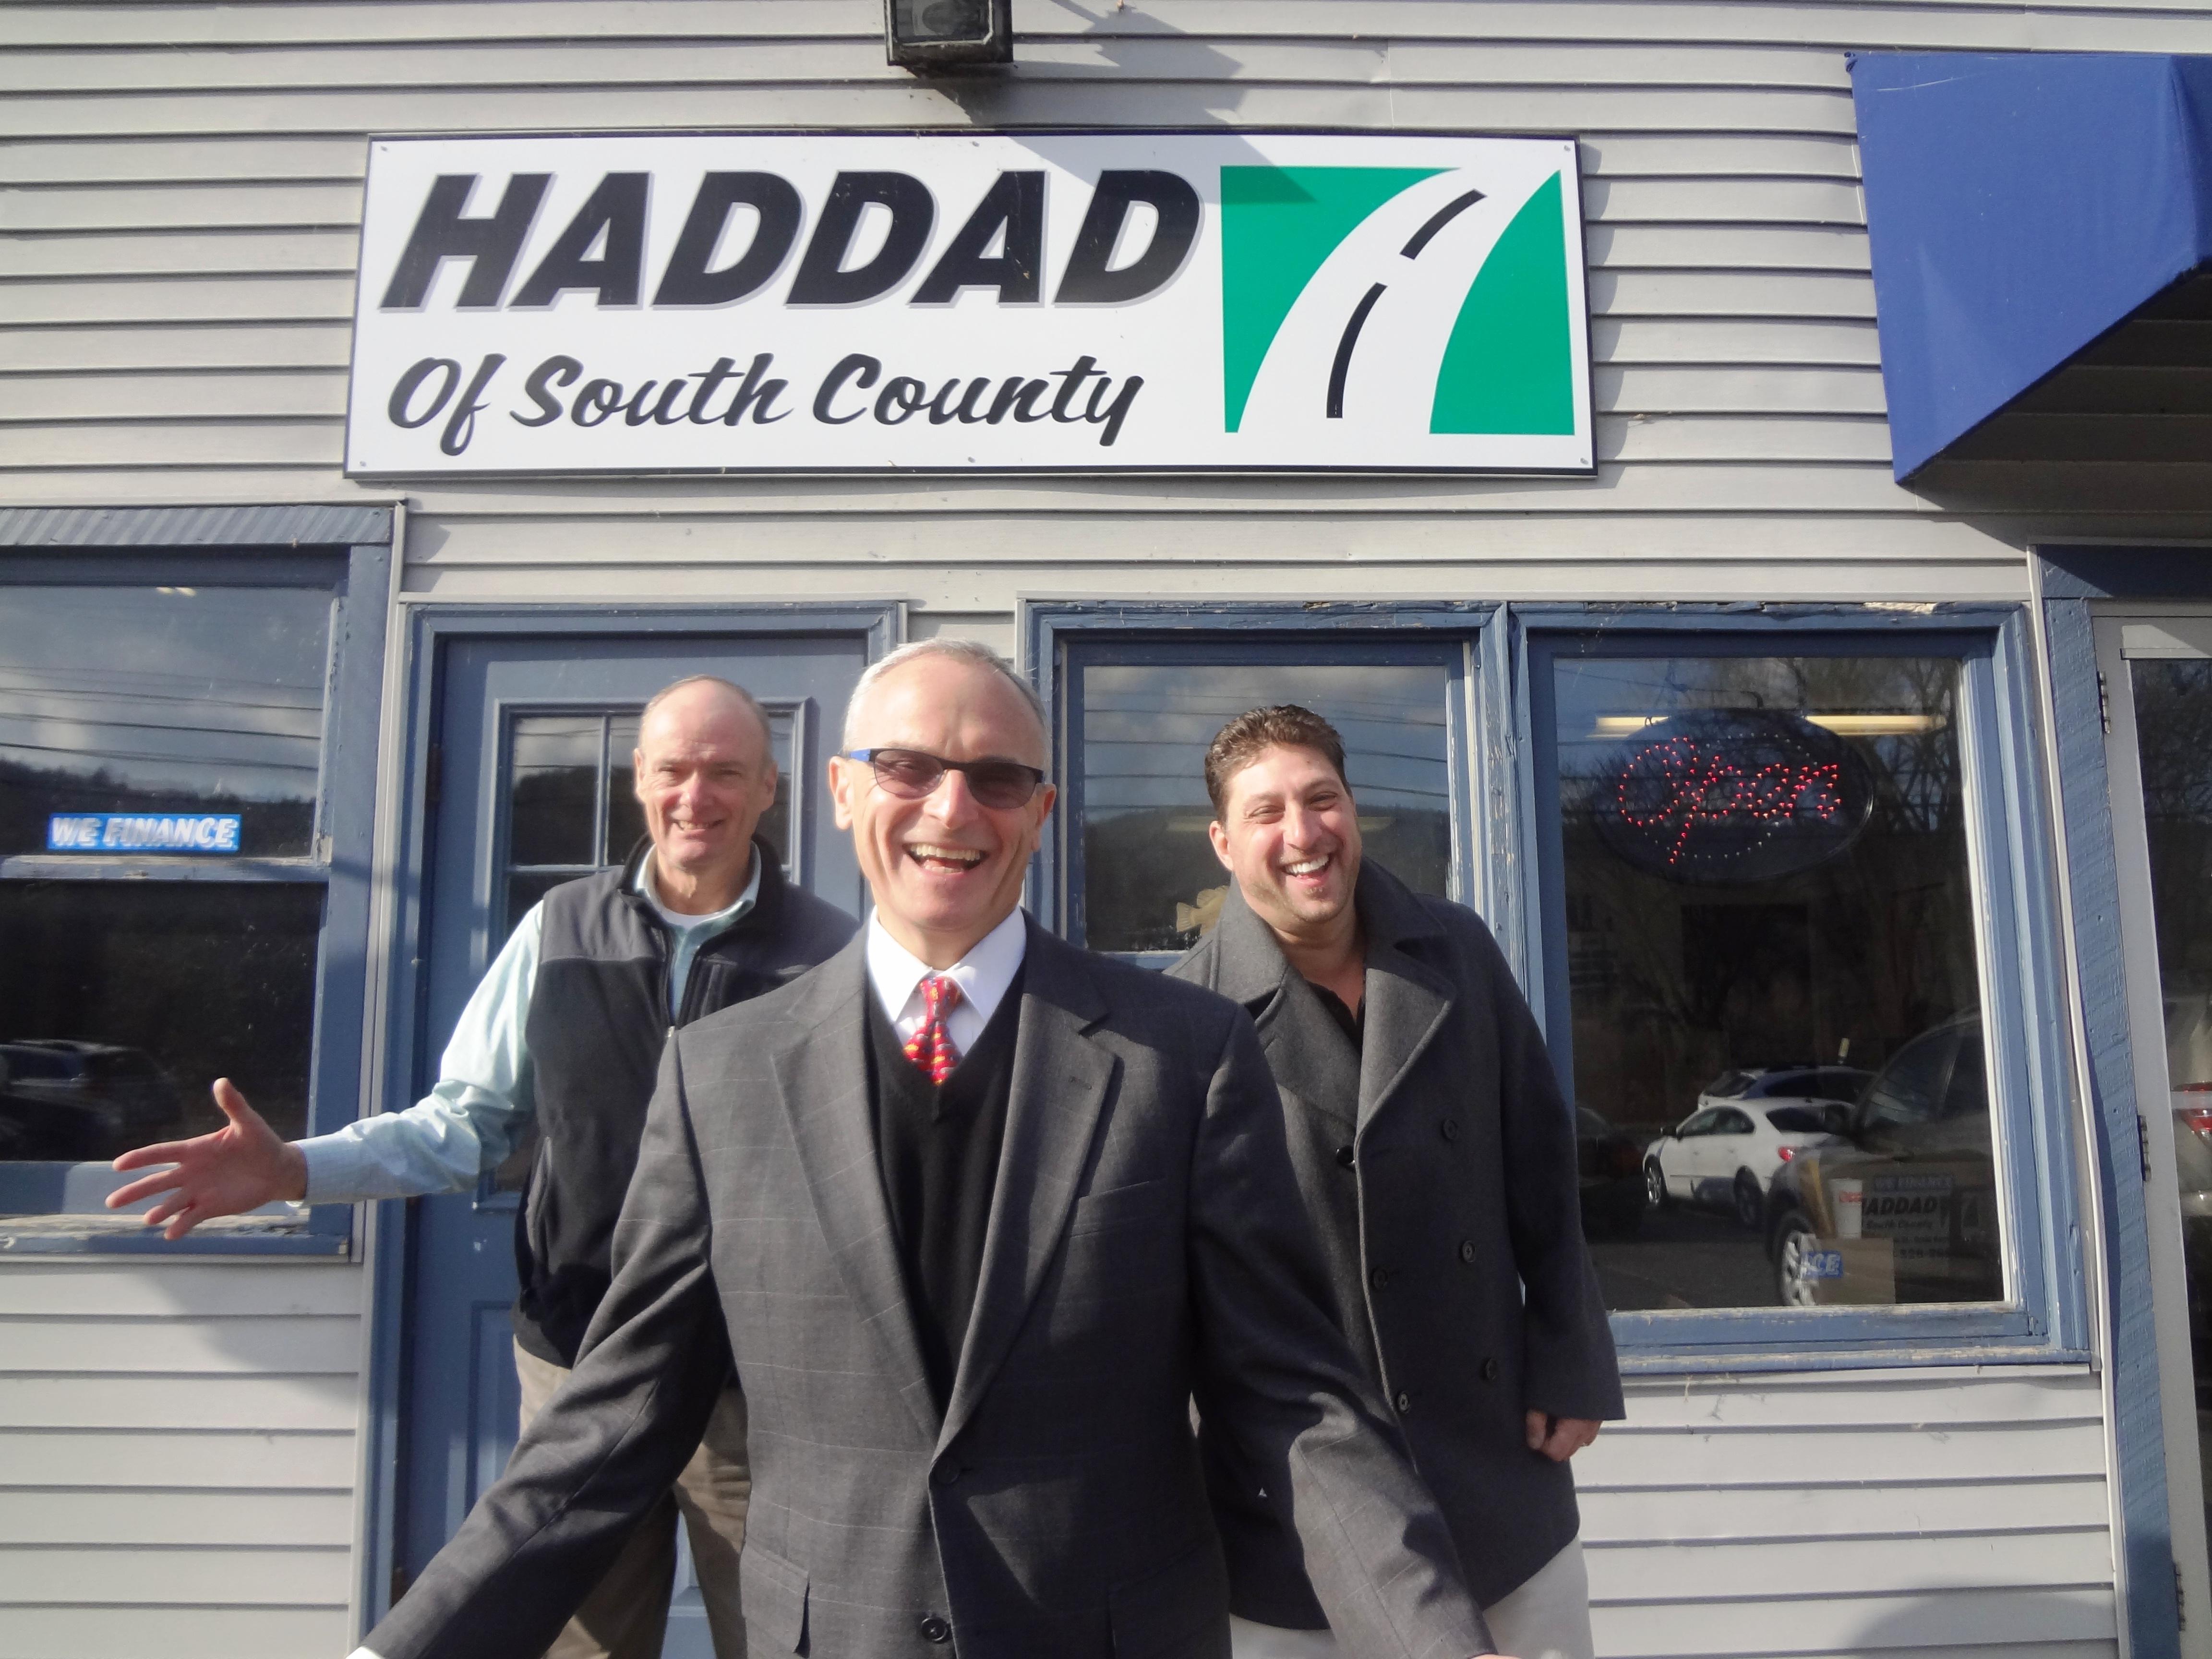 Haddad of South County, Great Barrington MA